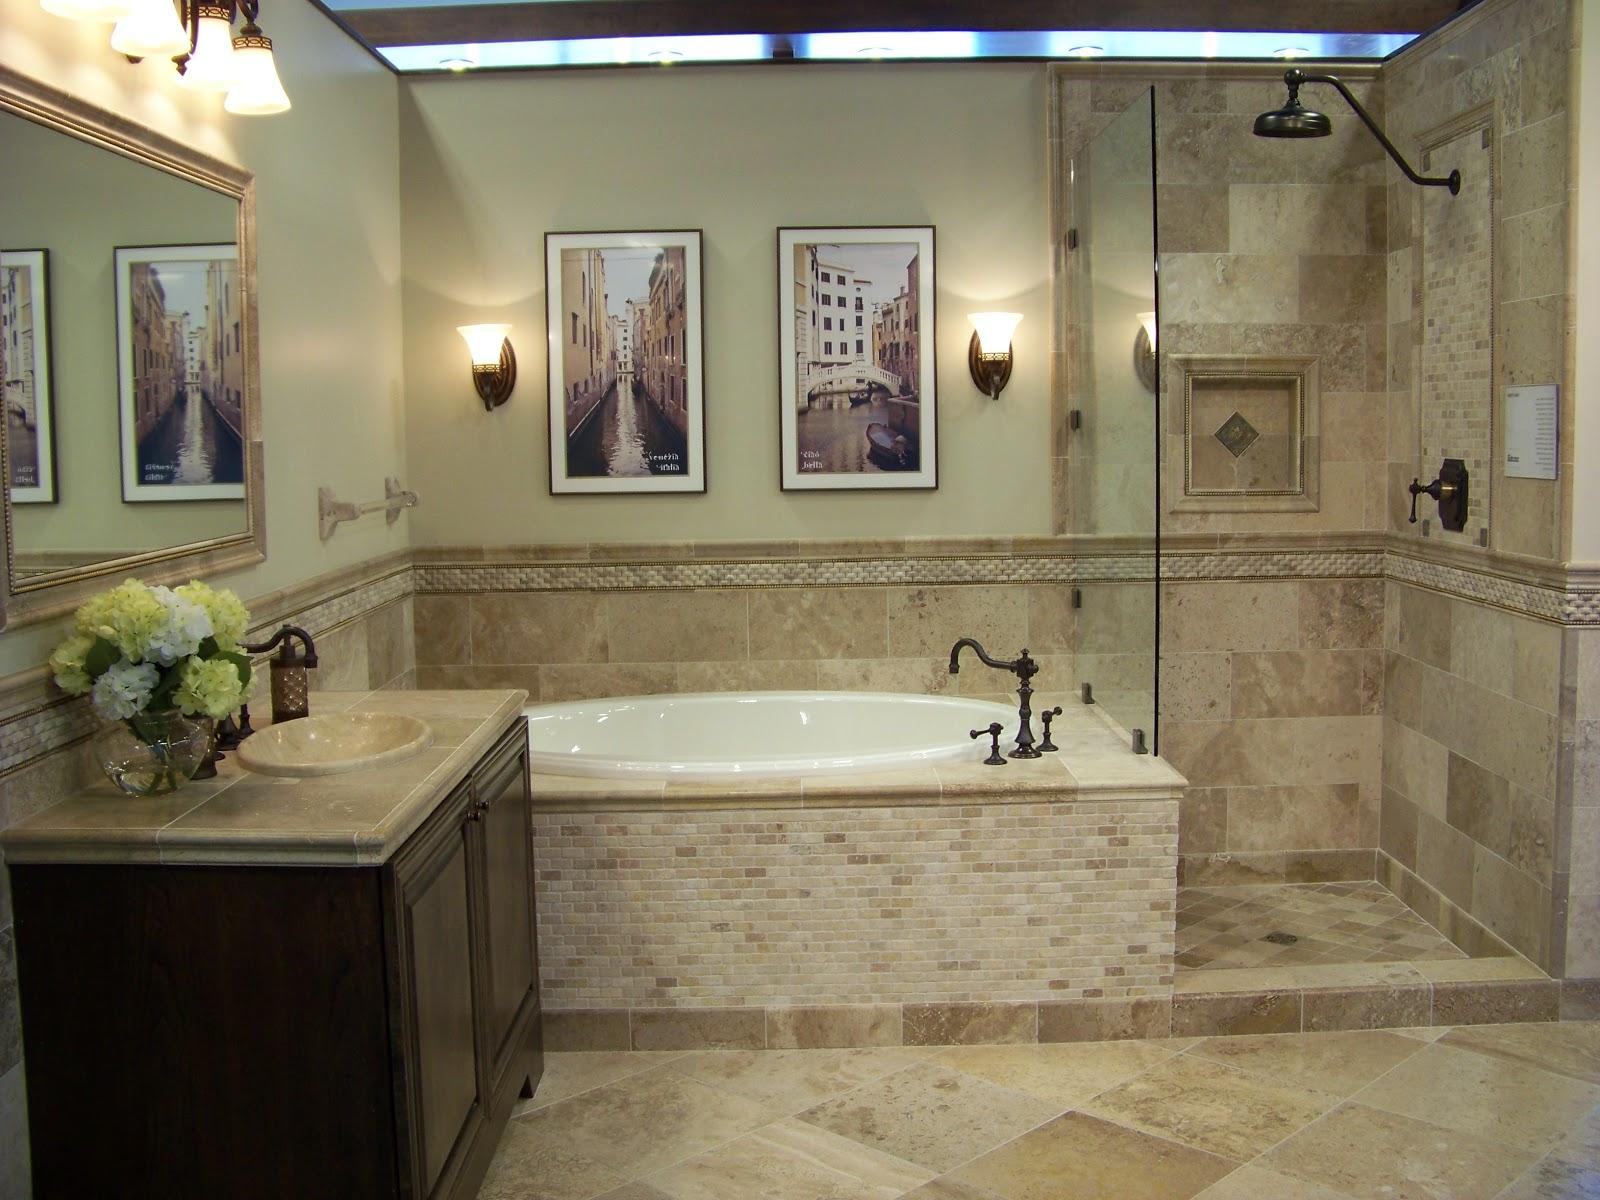 Home decor budgetista bathroom inspiration the tile shop - Bathroom wall tile ideas for small bathrooms ...